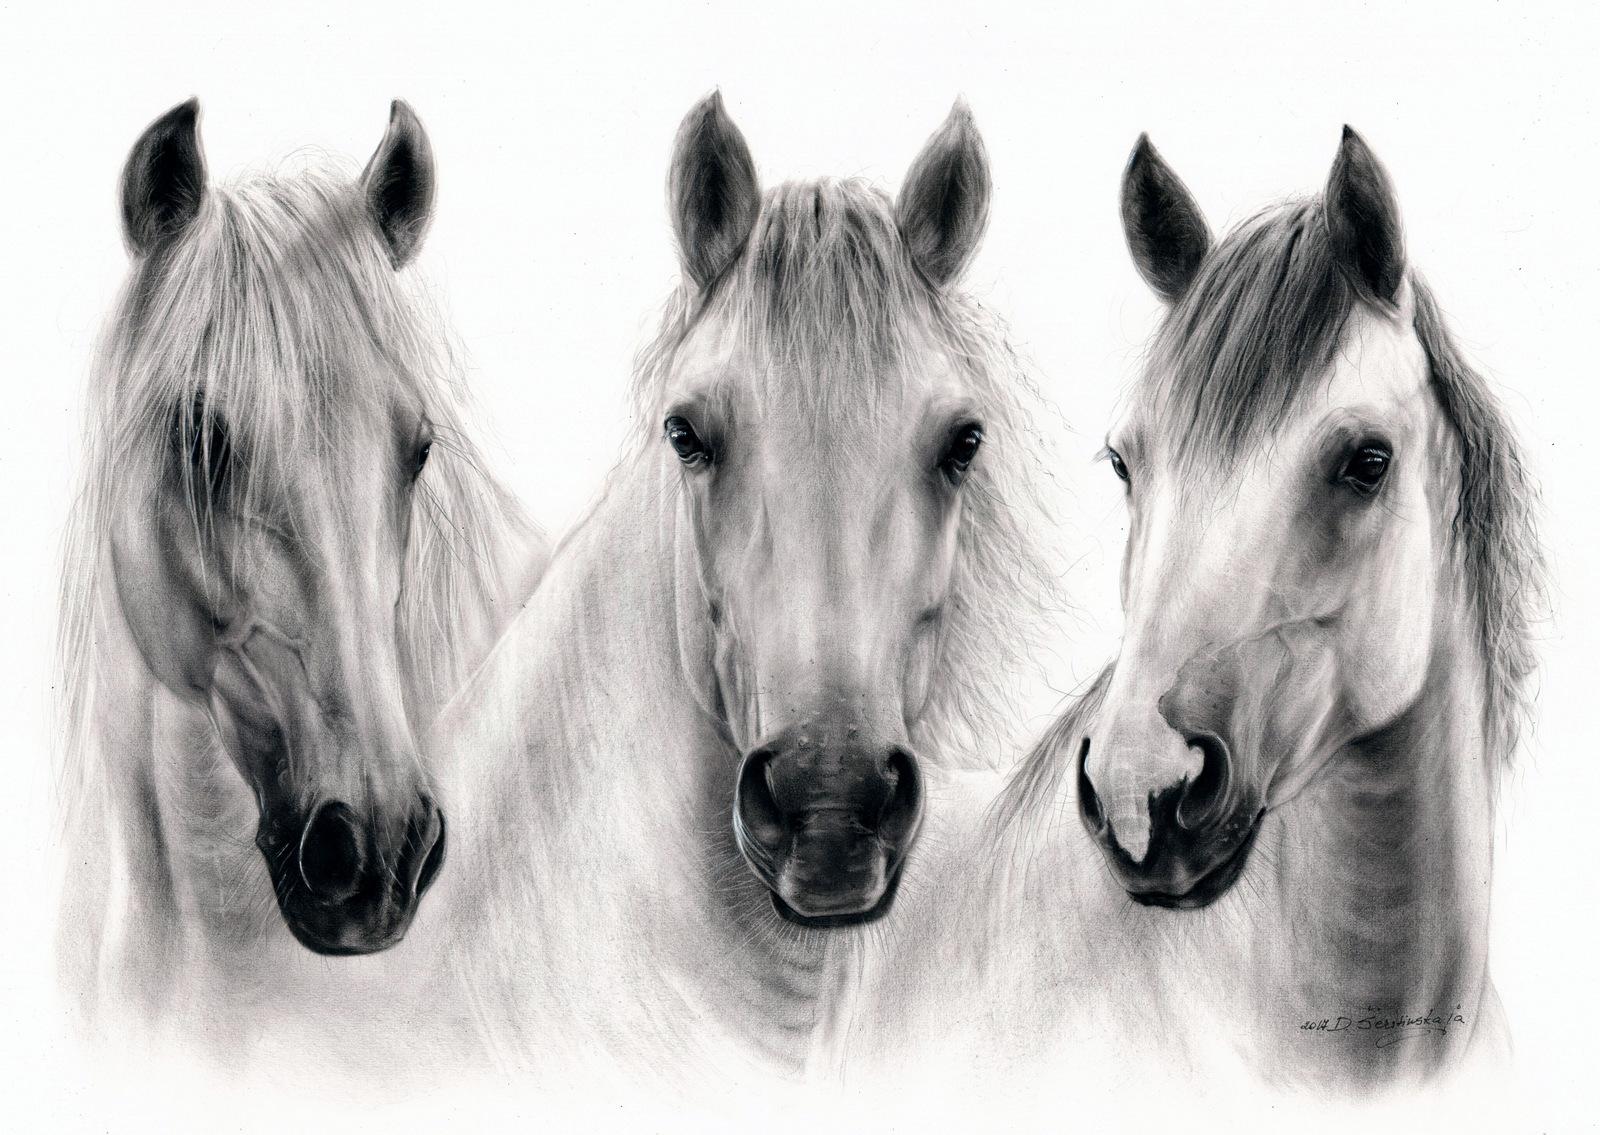 Pet Portrait Wildlife Artist Danguole Serstinskaja Equine Art